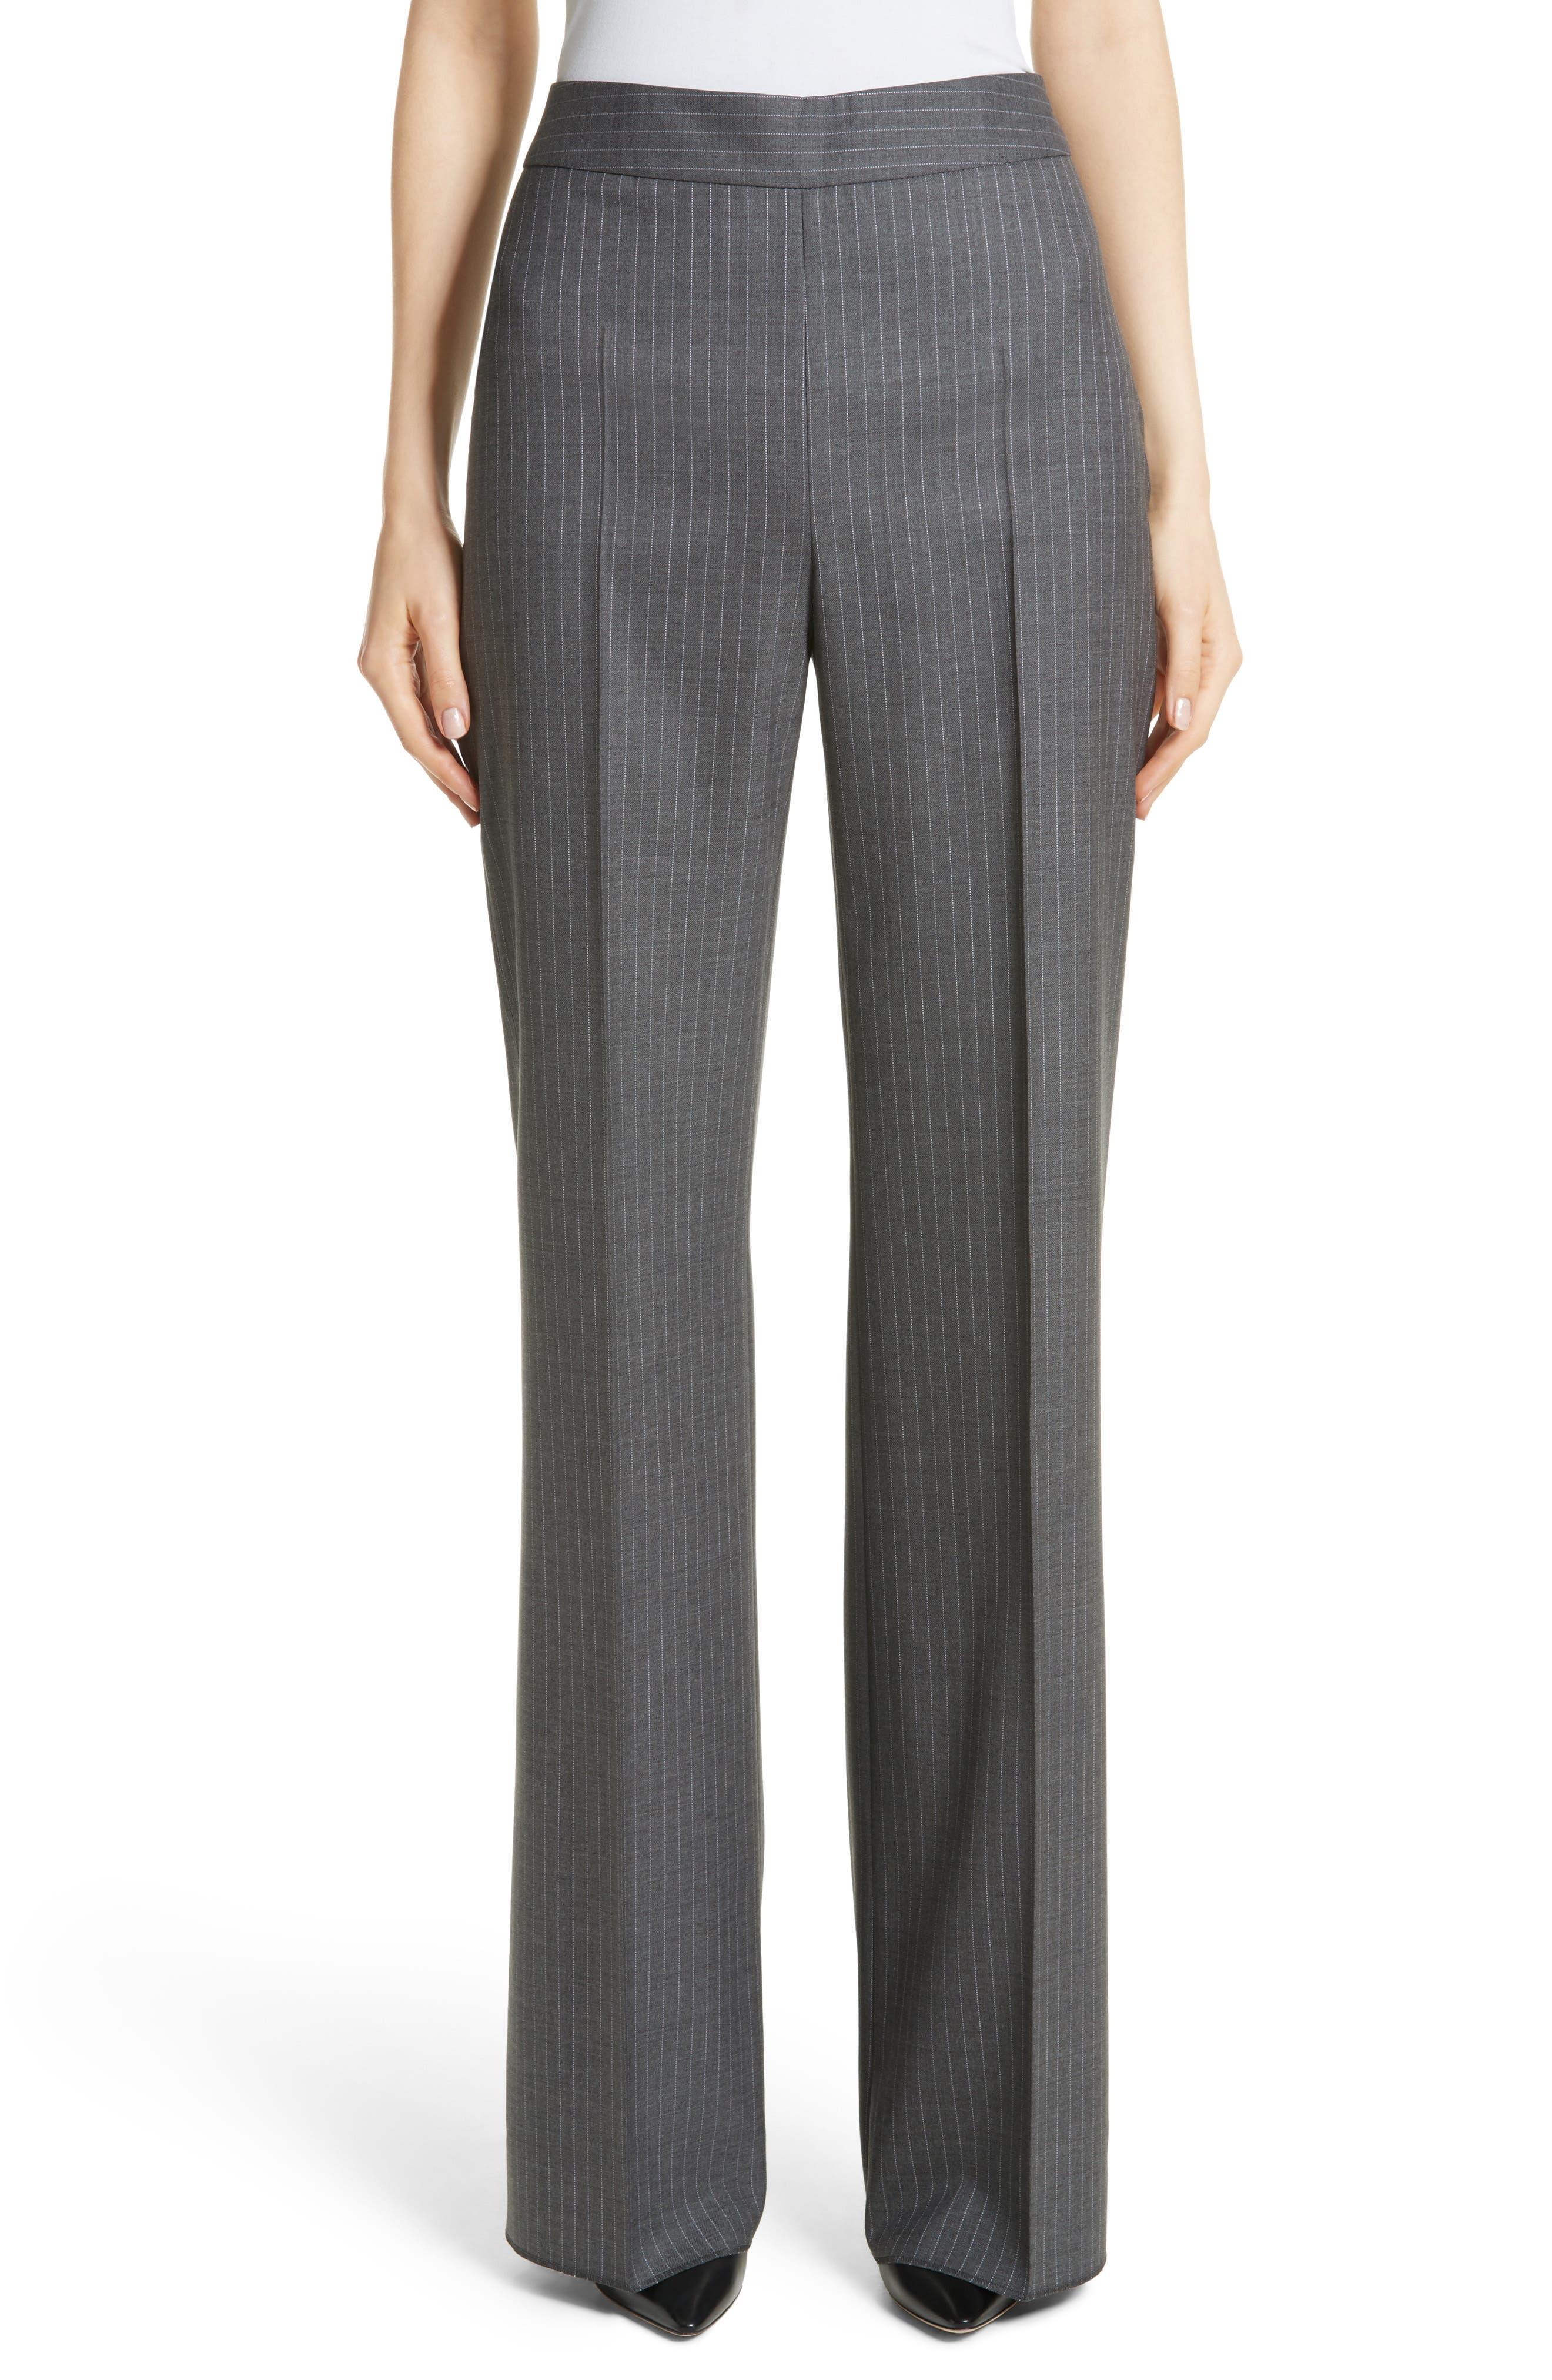 Garibo Stretch Wool Pinstripe Pants,                             Main thumbnail 1, color,                             034